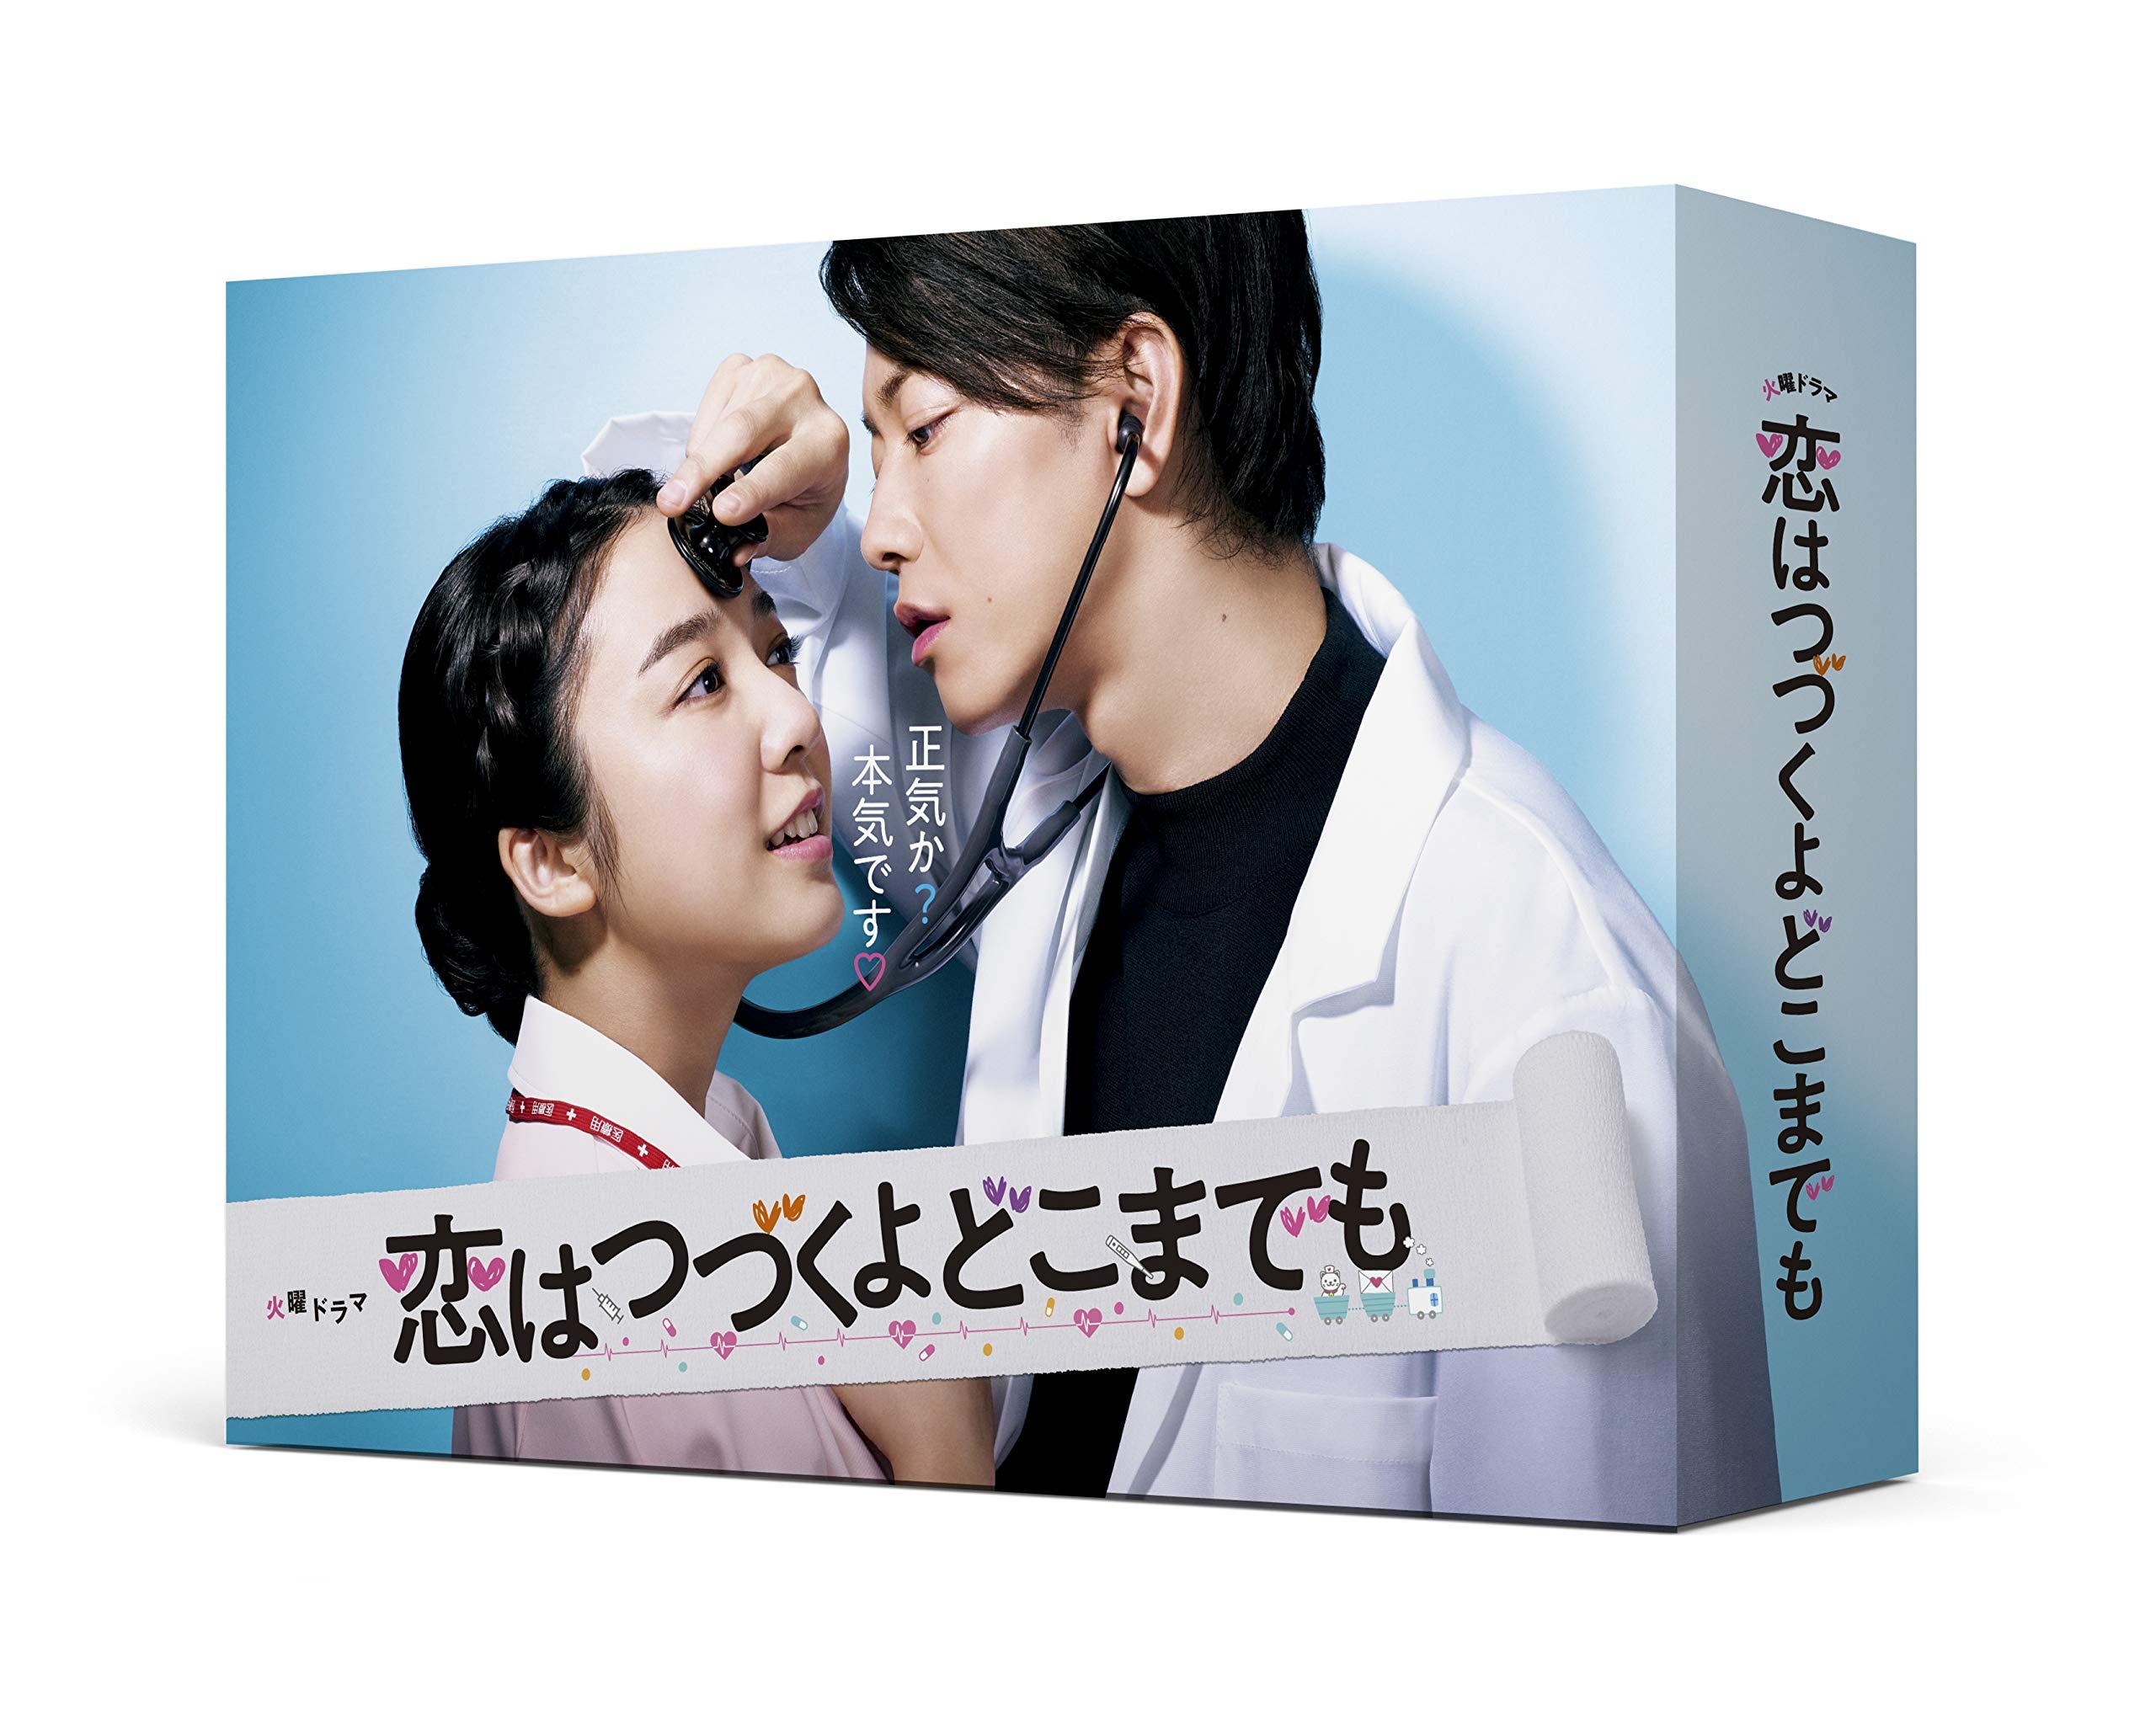 【TVドラマ】『恋はつづくよどこまでも』Blu-ray&DVD BOX 予約特典・店舗特典【7月22日】